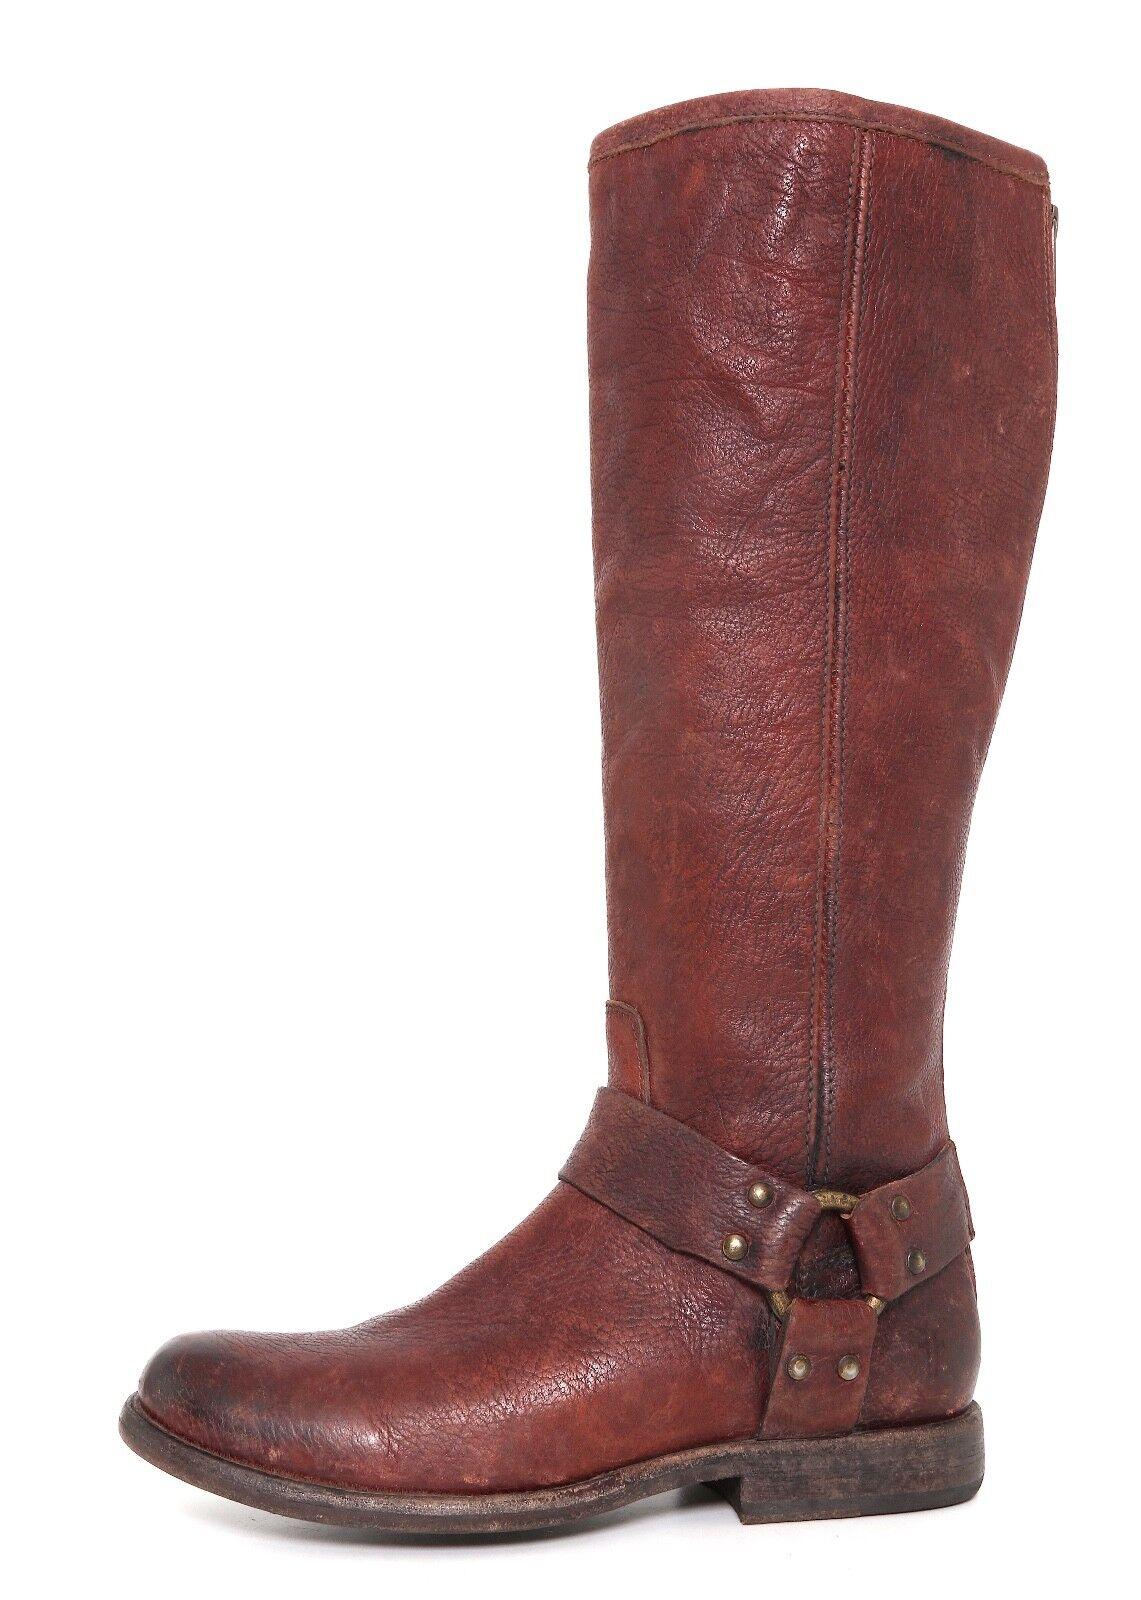 Frye Phillip Harness Tall bota de cuero marrón para para para mujer talla 6 B 6674   distribución global